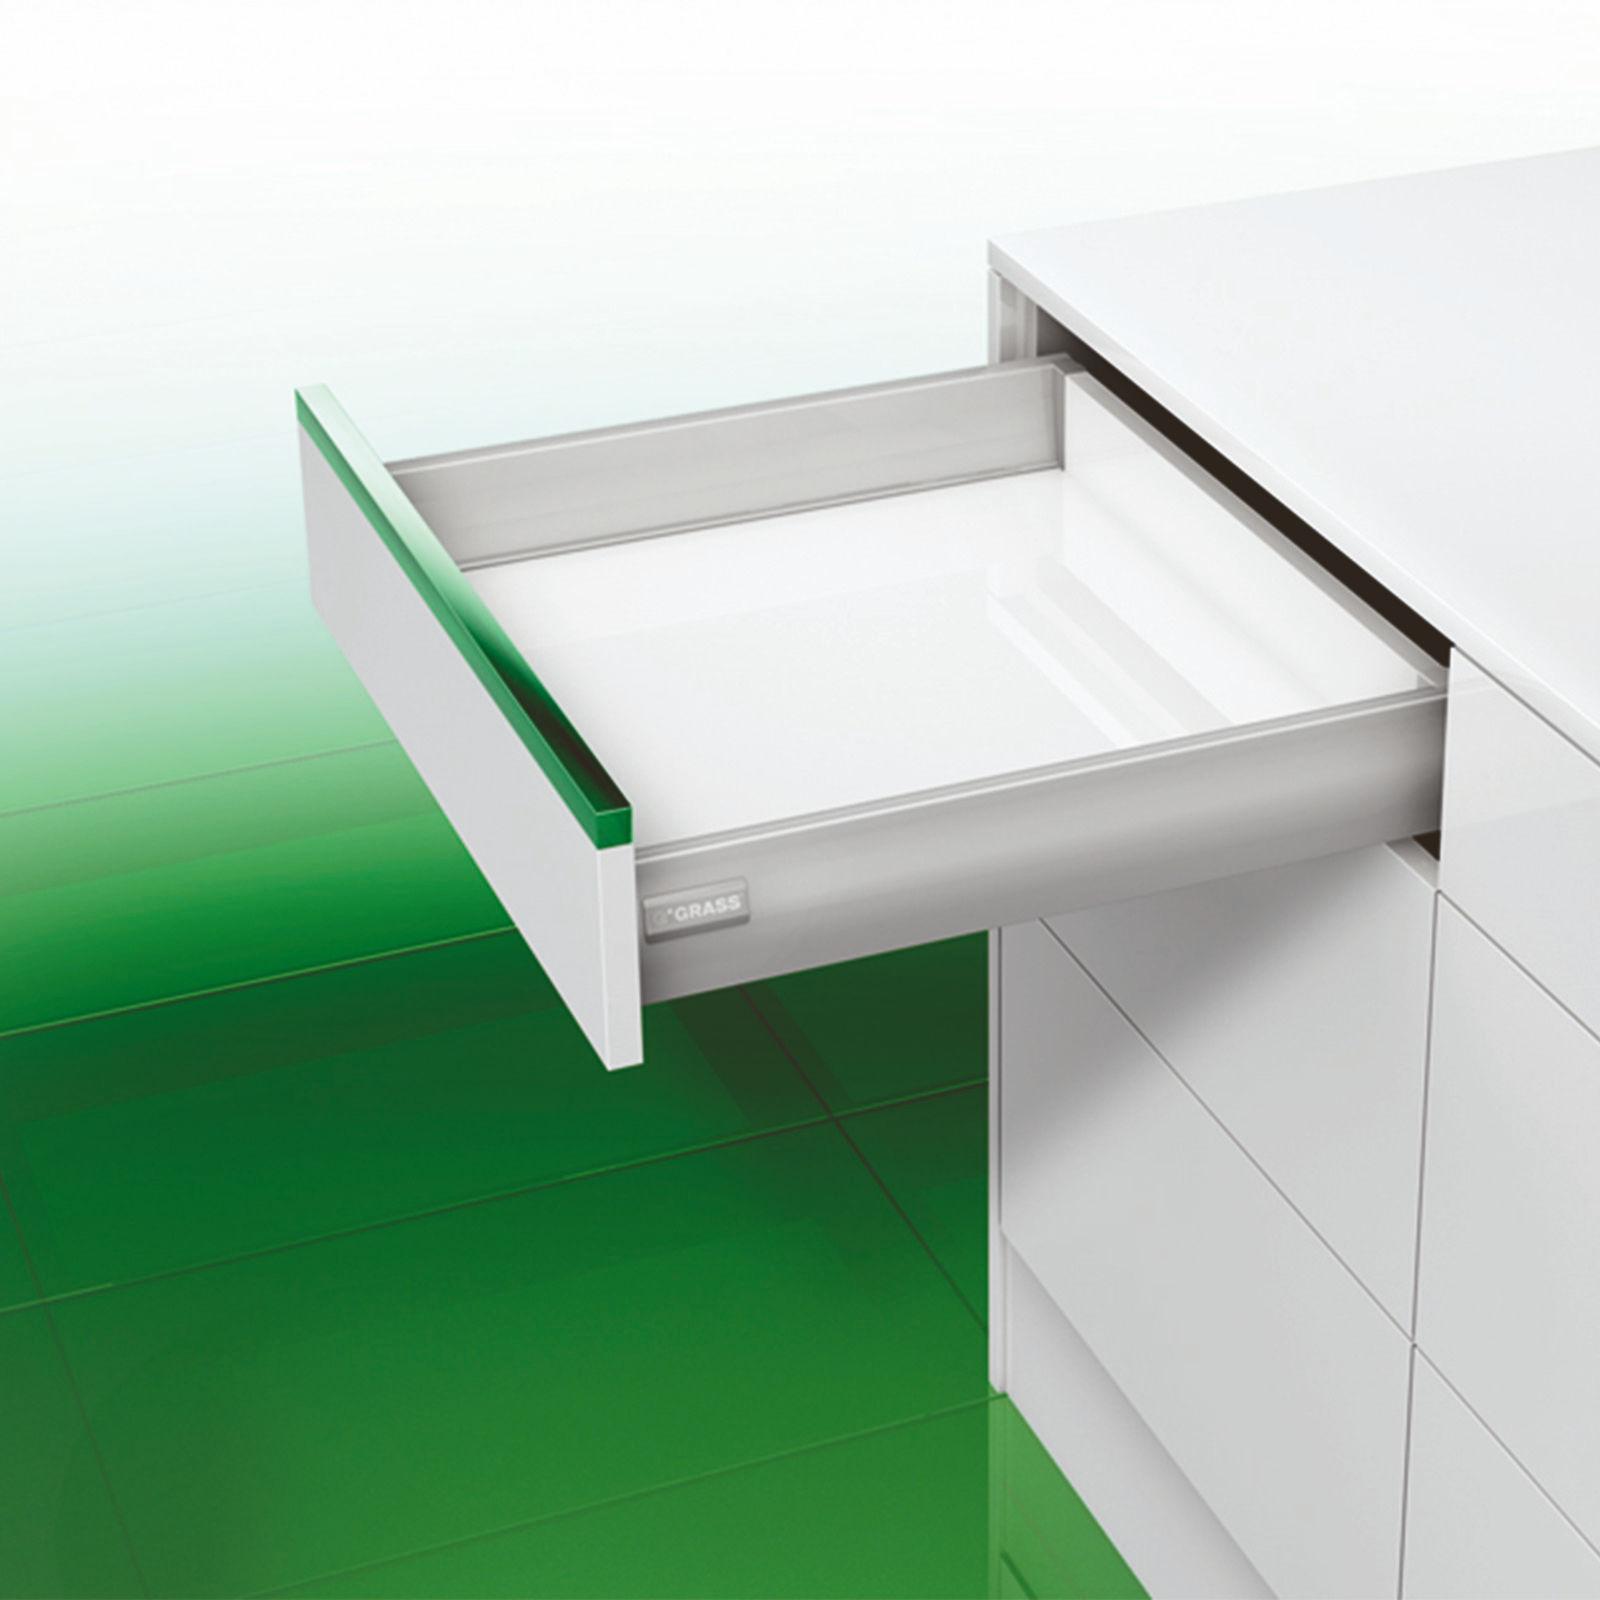 grass dwd xp schubkastensystem 40 kg mit softclose. Black Bedroom Furniture Sets. Home Design Ideas